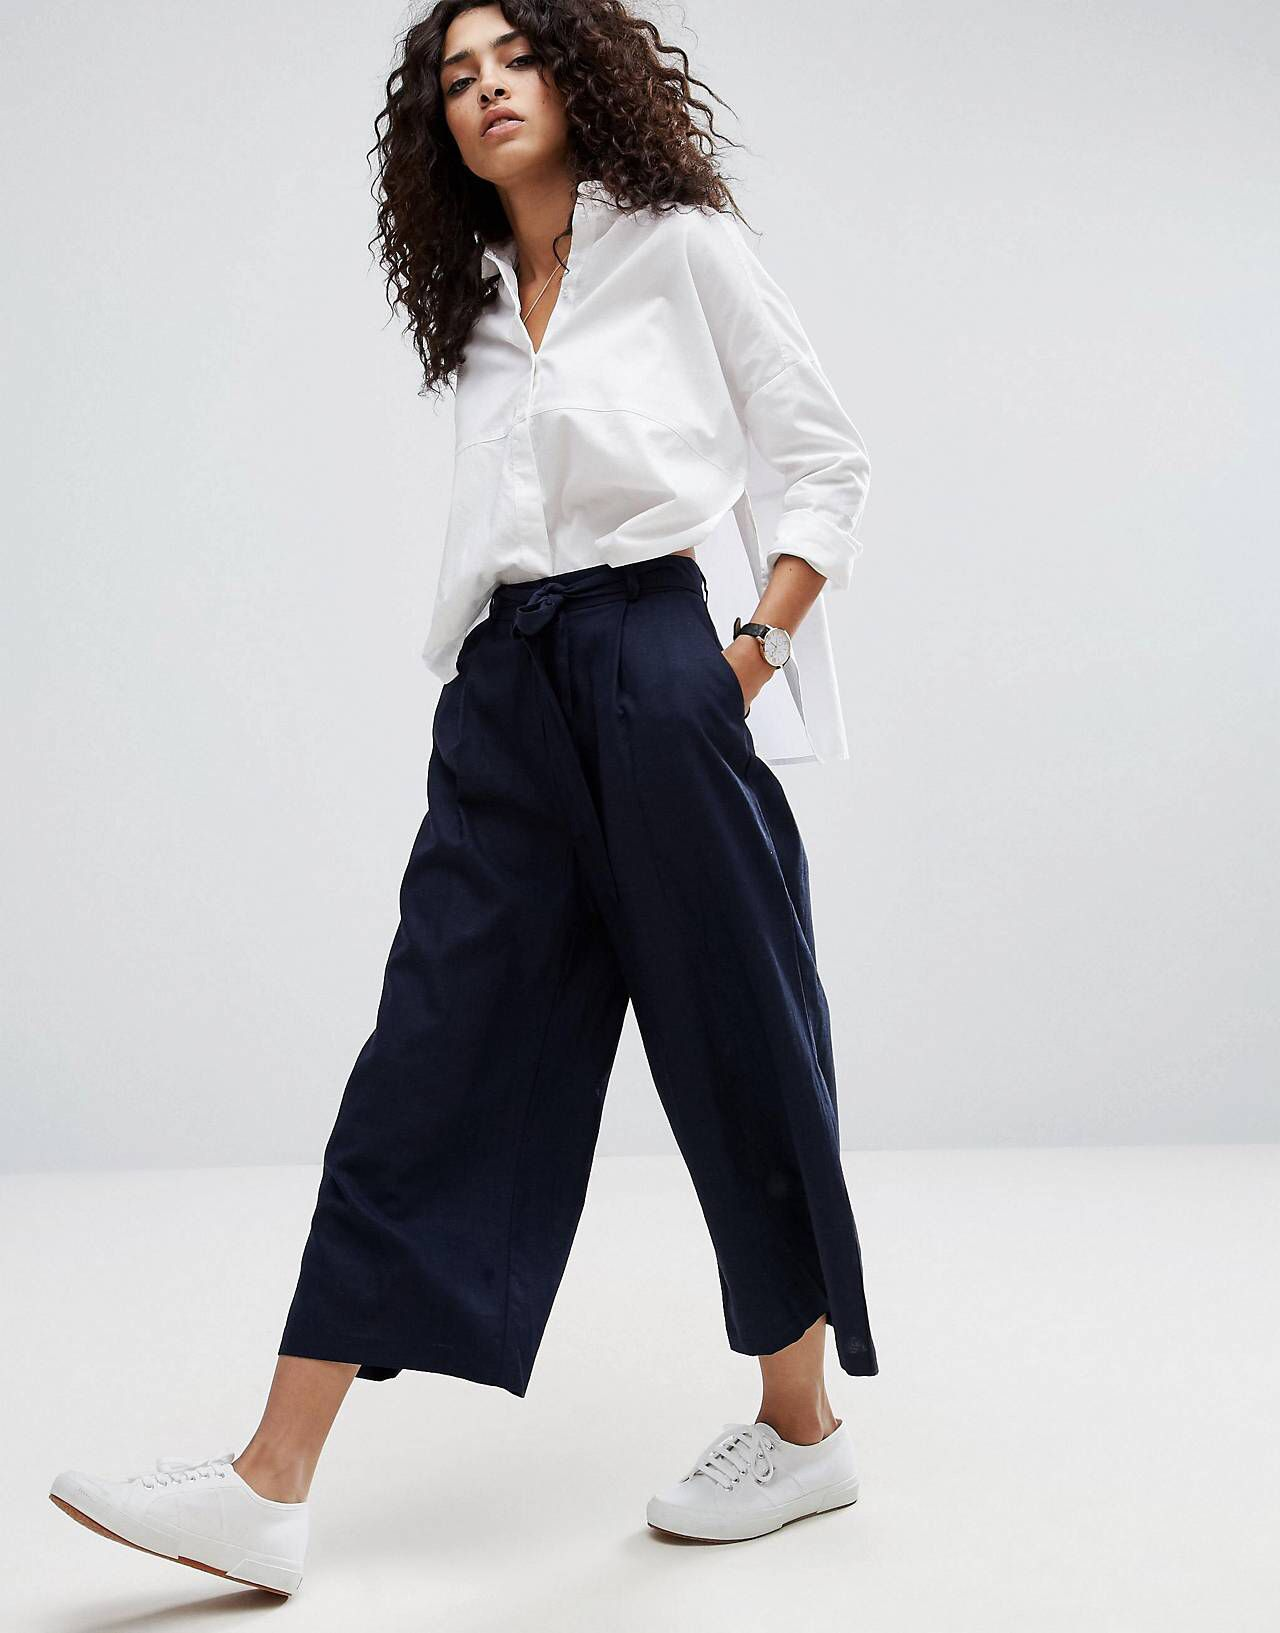 asos jupe culotte en lin casual stylish looks pinterest jupe culotte asos et jupes. Black Bedroom Furniture Sets. Home Design Ideas